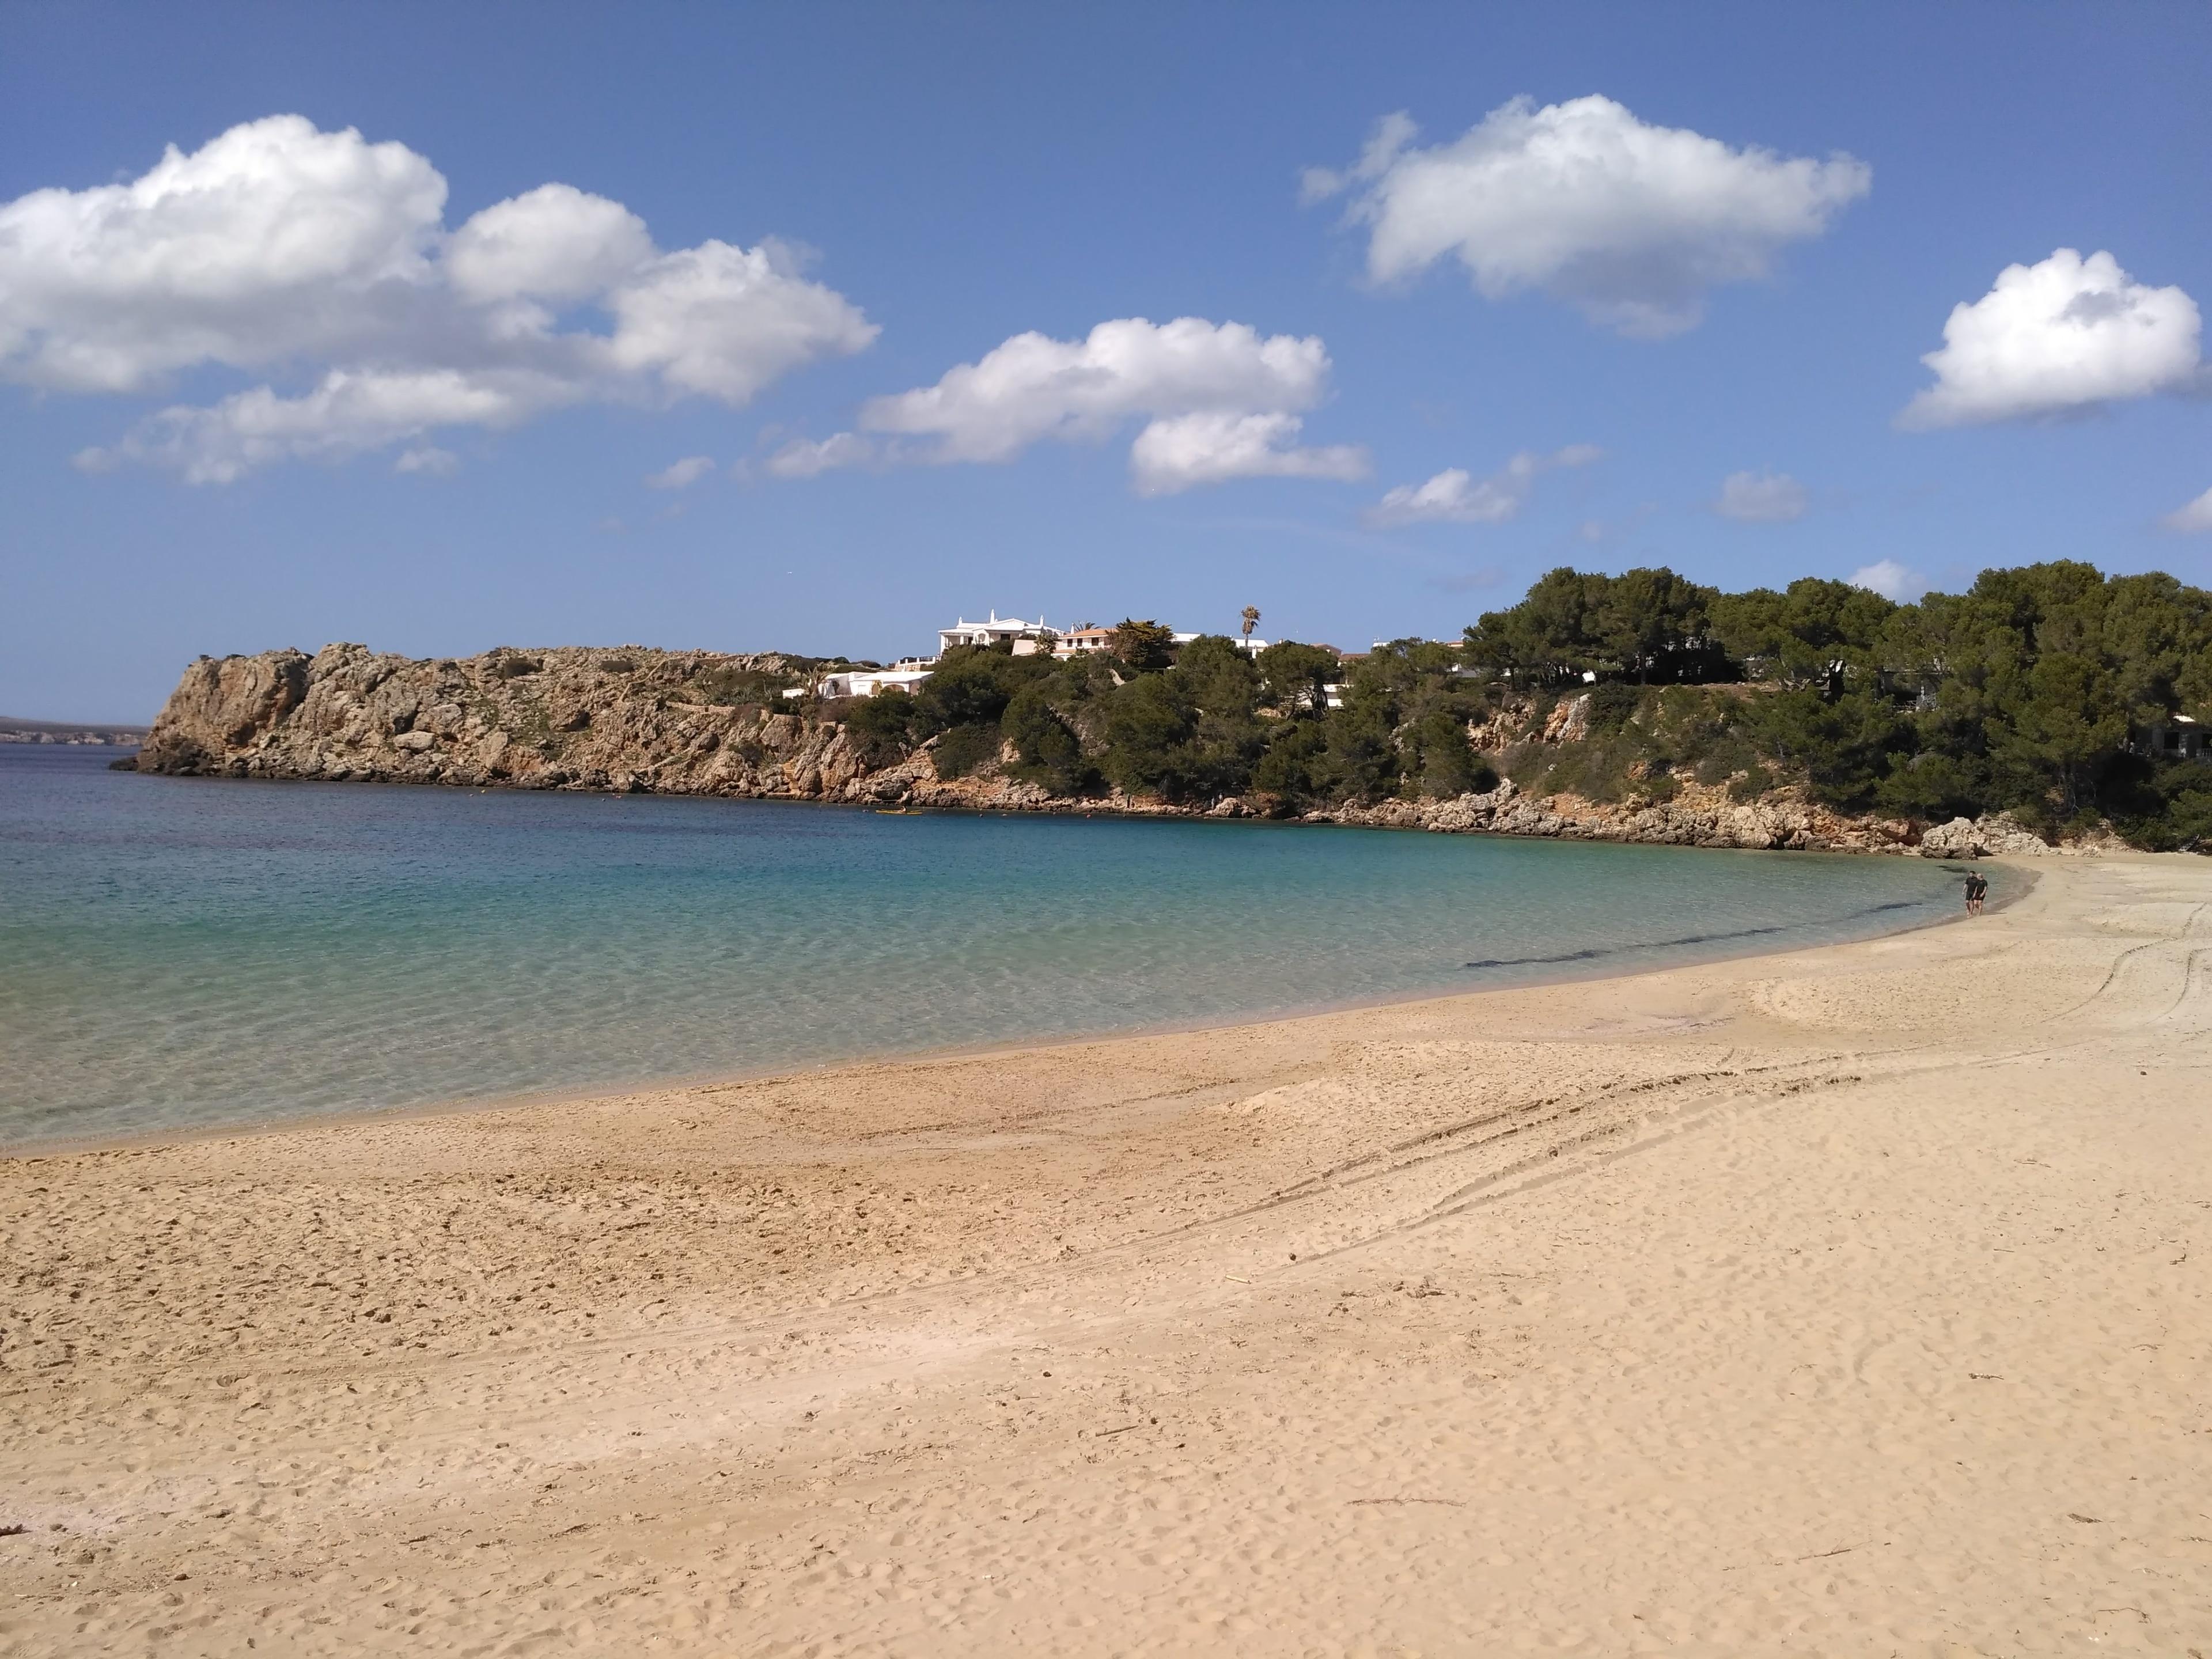 Arenal d'en Castell, Mercadal, Balearic Islands, Spain